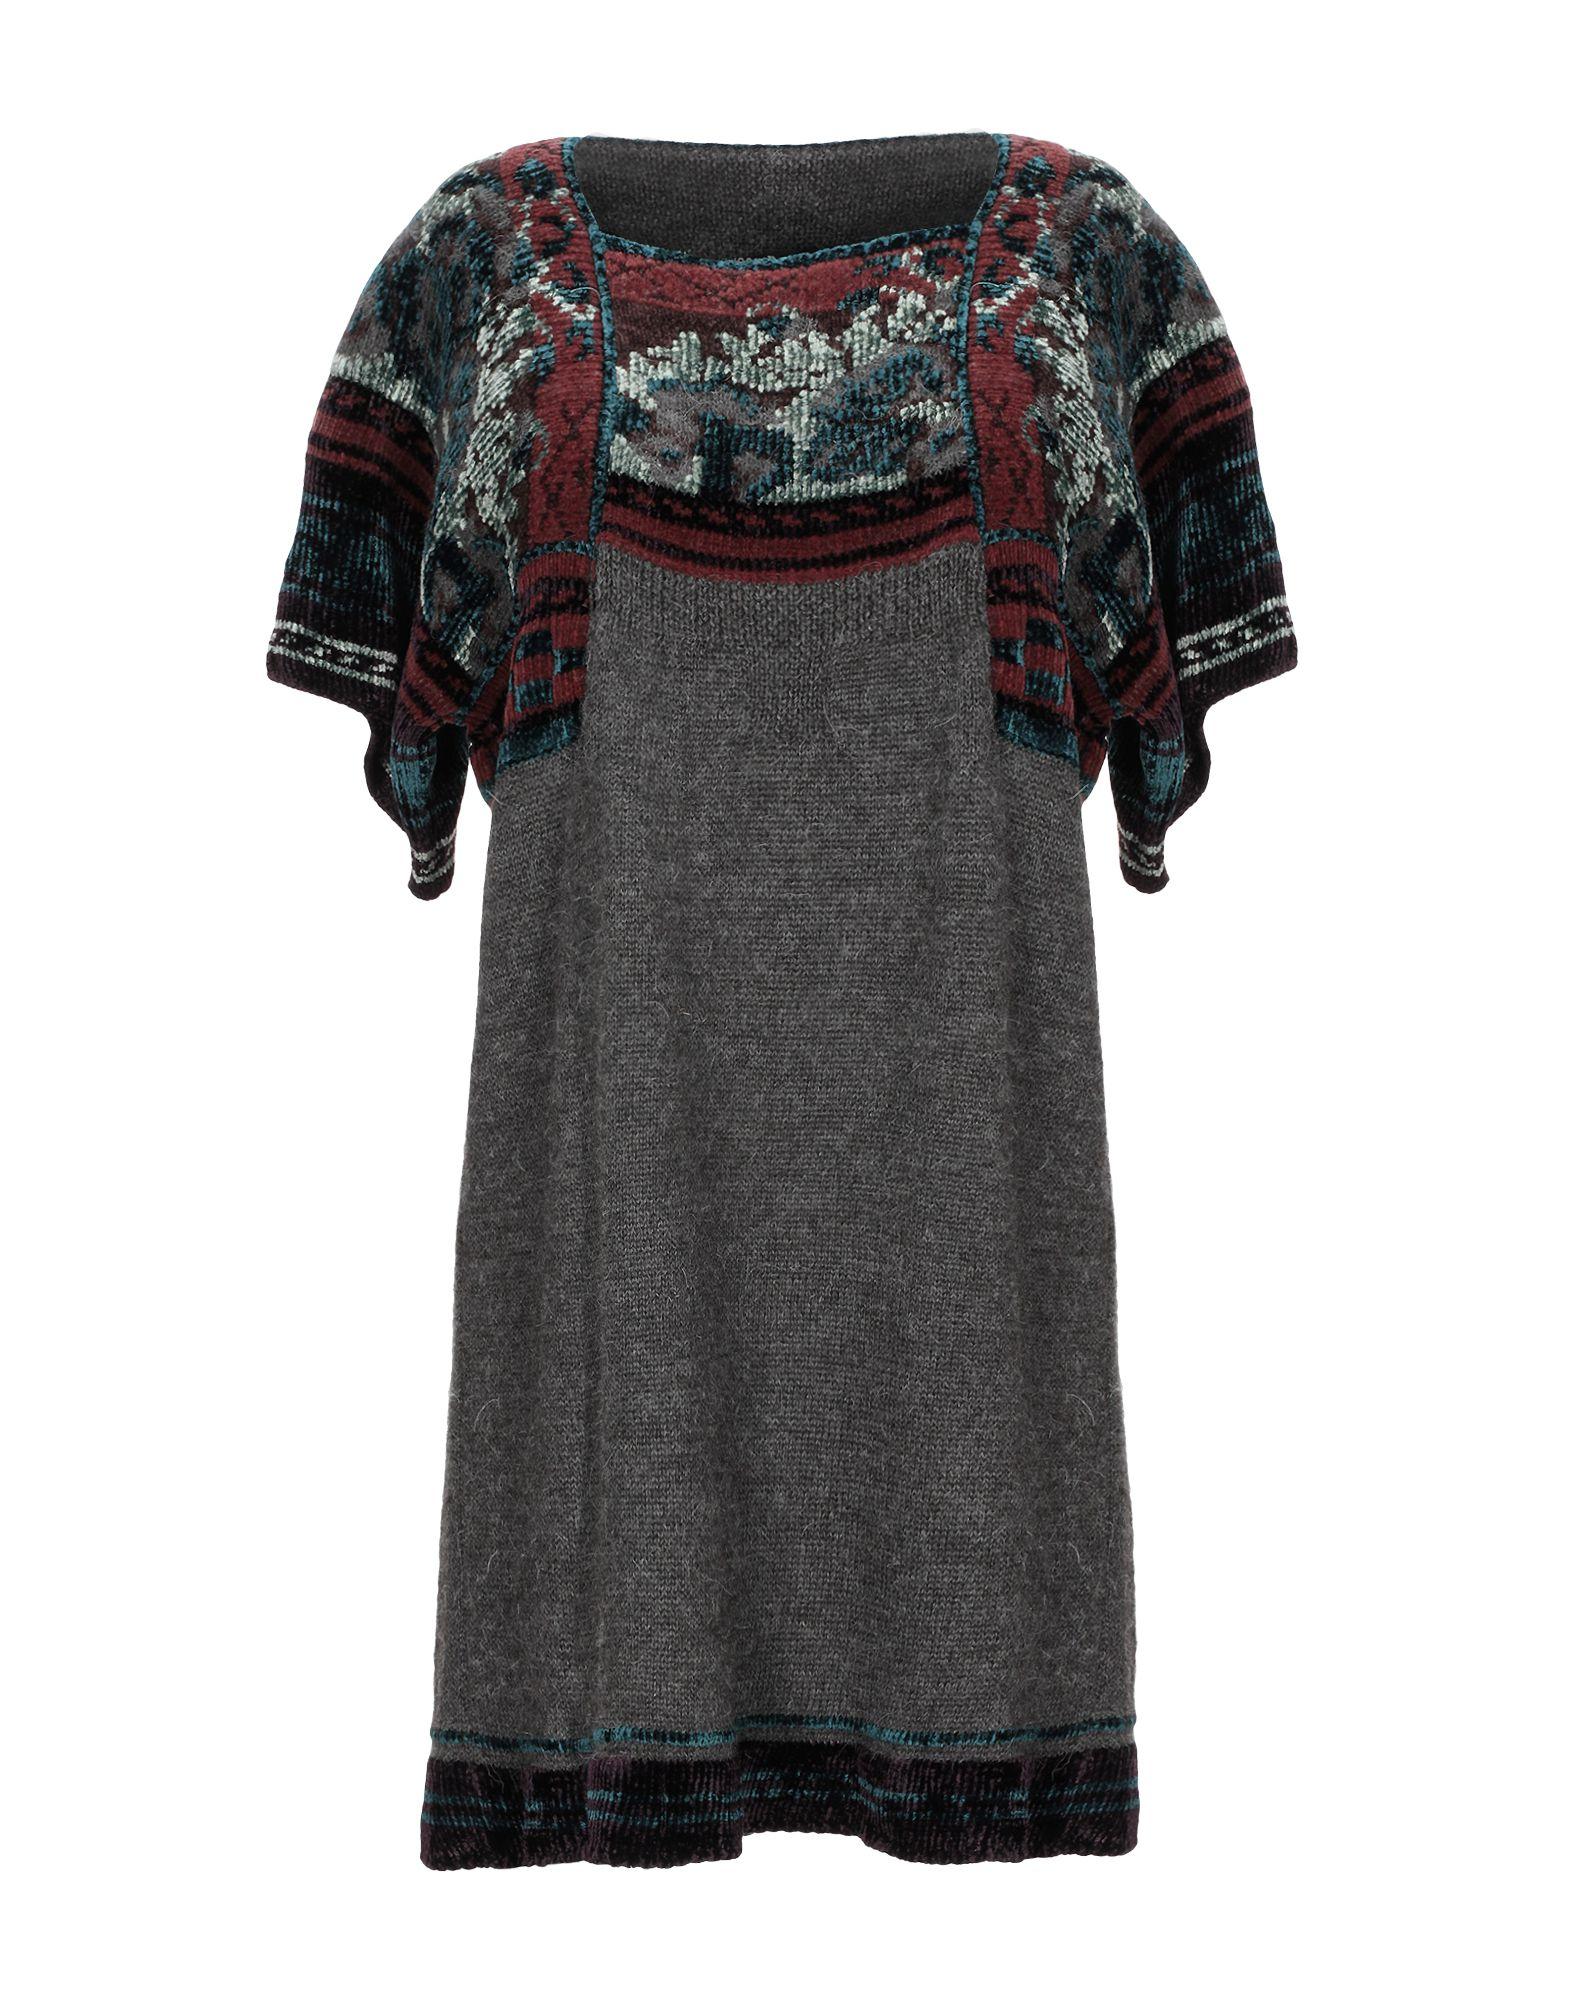 JEAN PAUL GAULTIER MAILLE FEMME Короткое платье jean paul gaultier femme длинная юбка